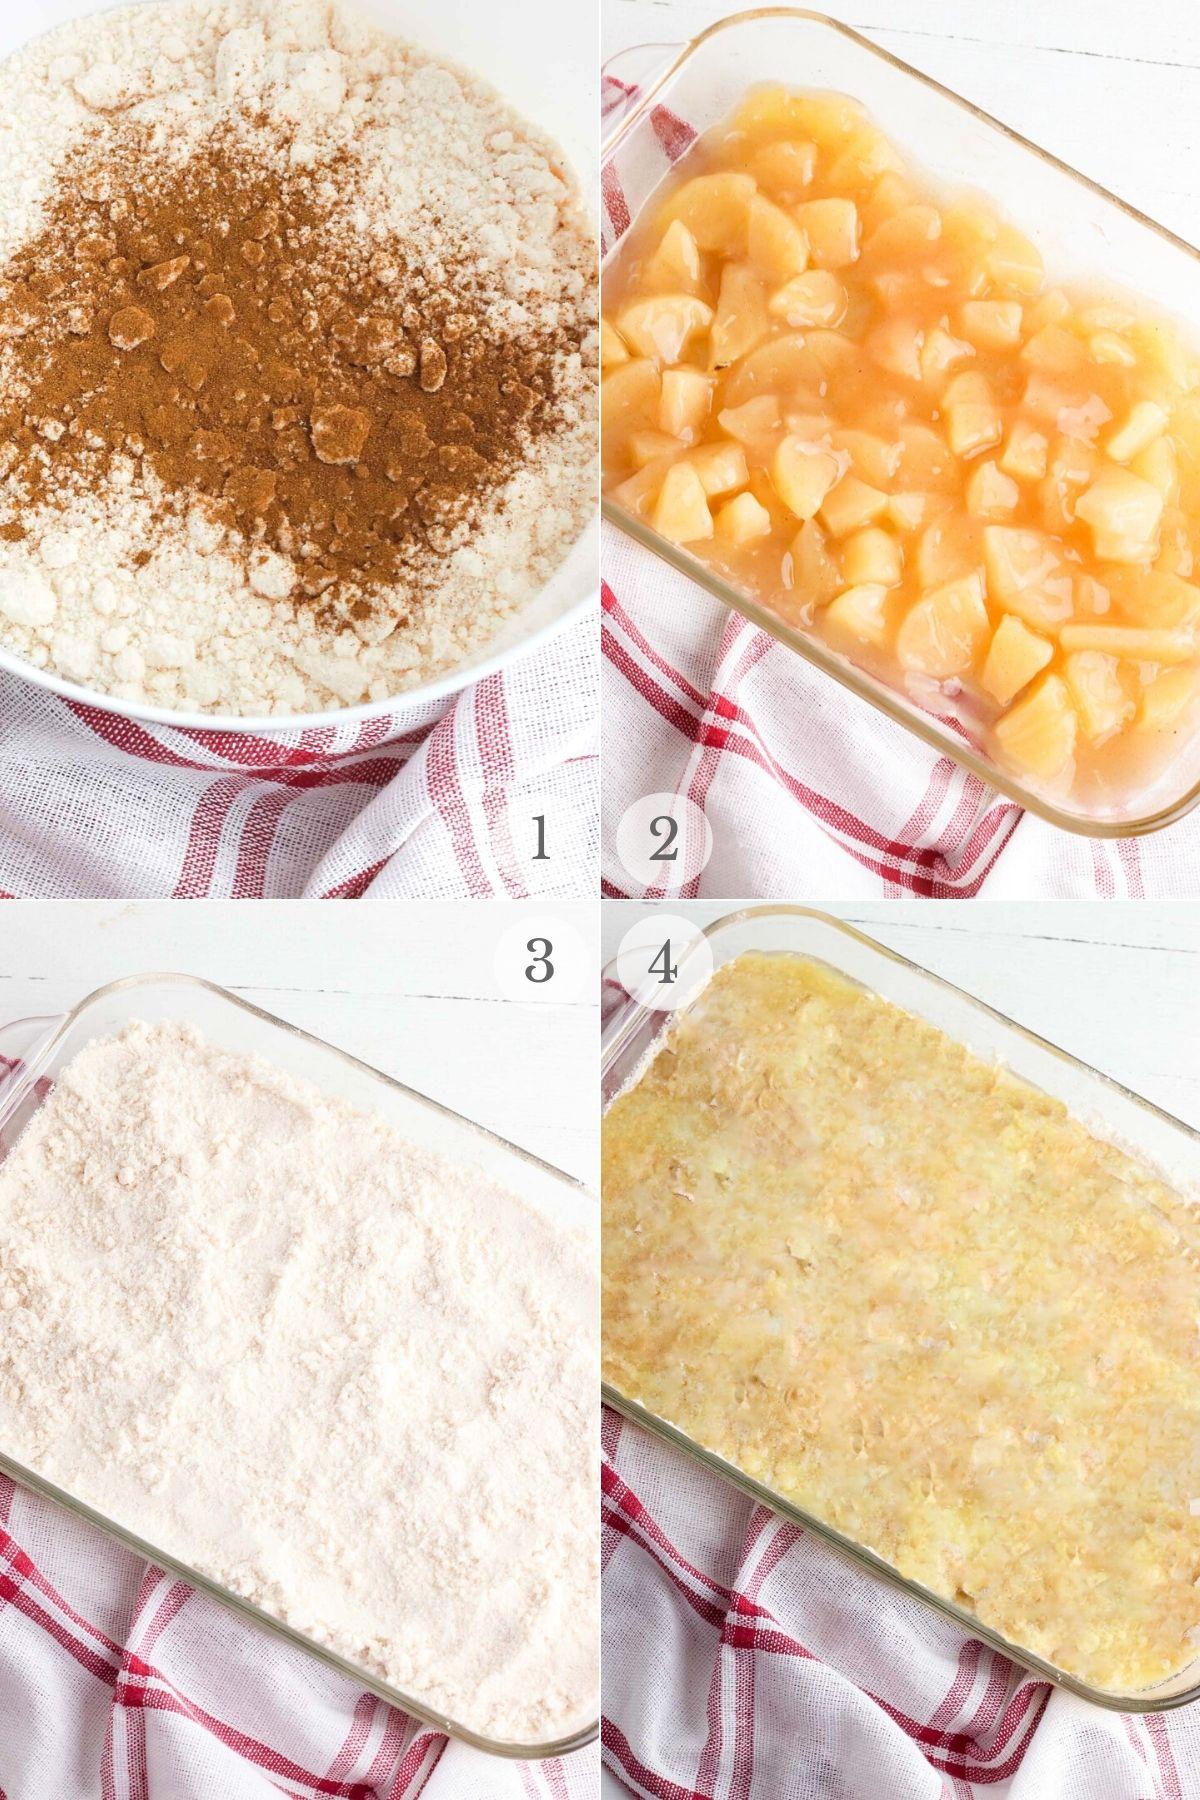 apple dump cake recipe steps 1-4